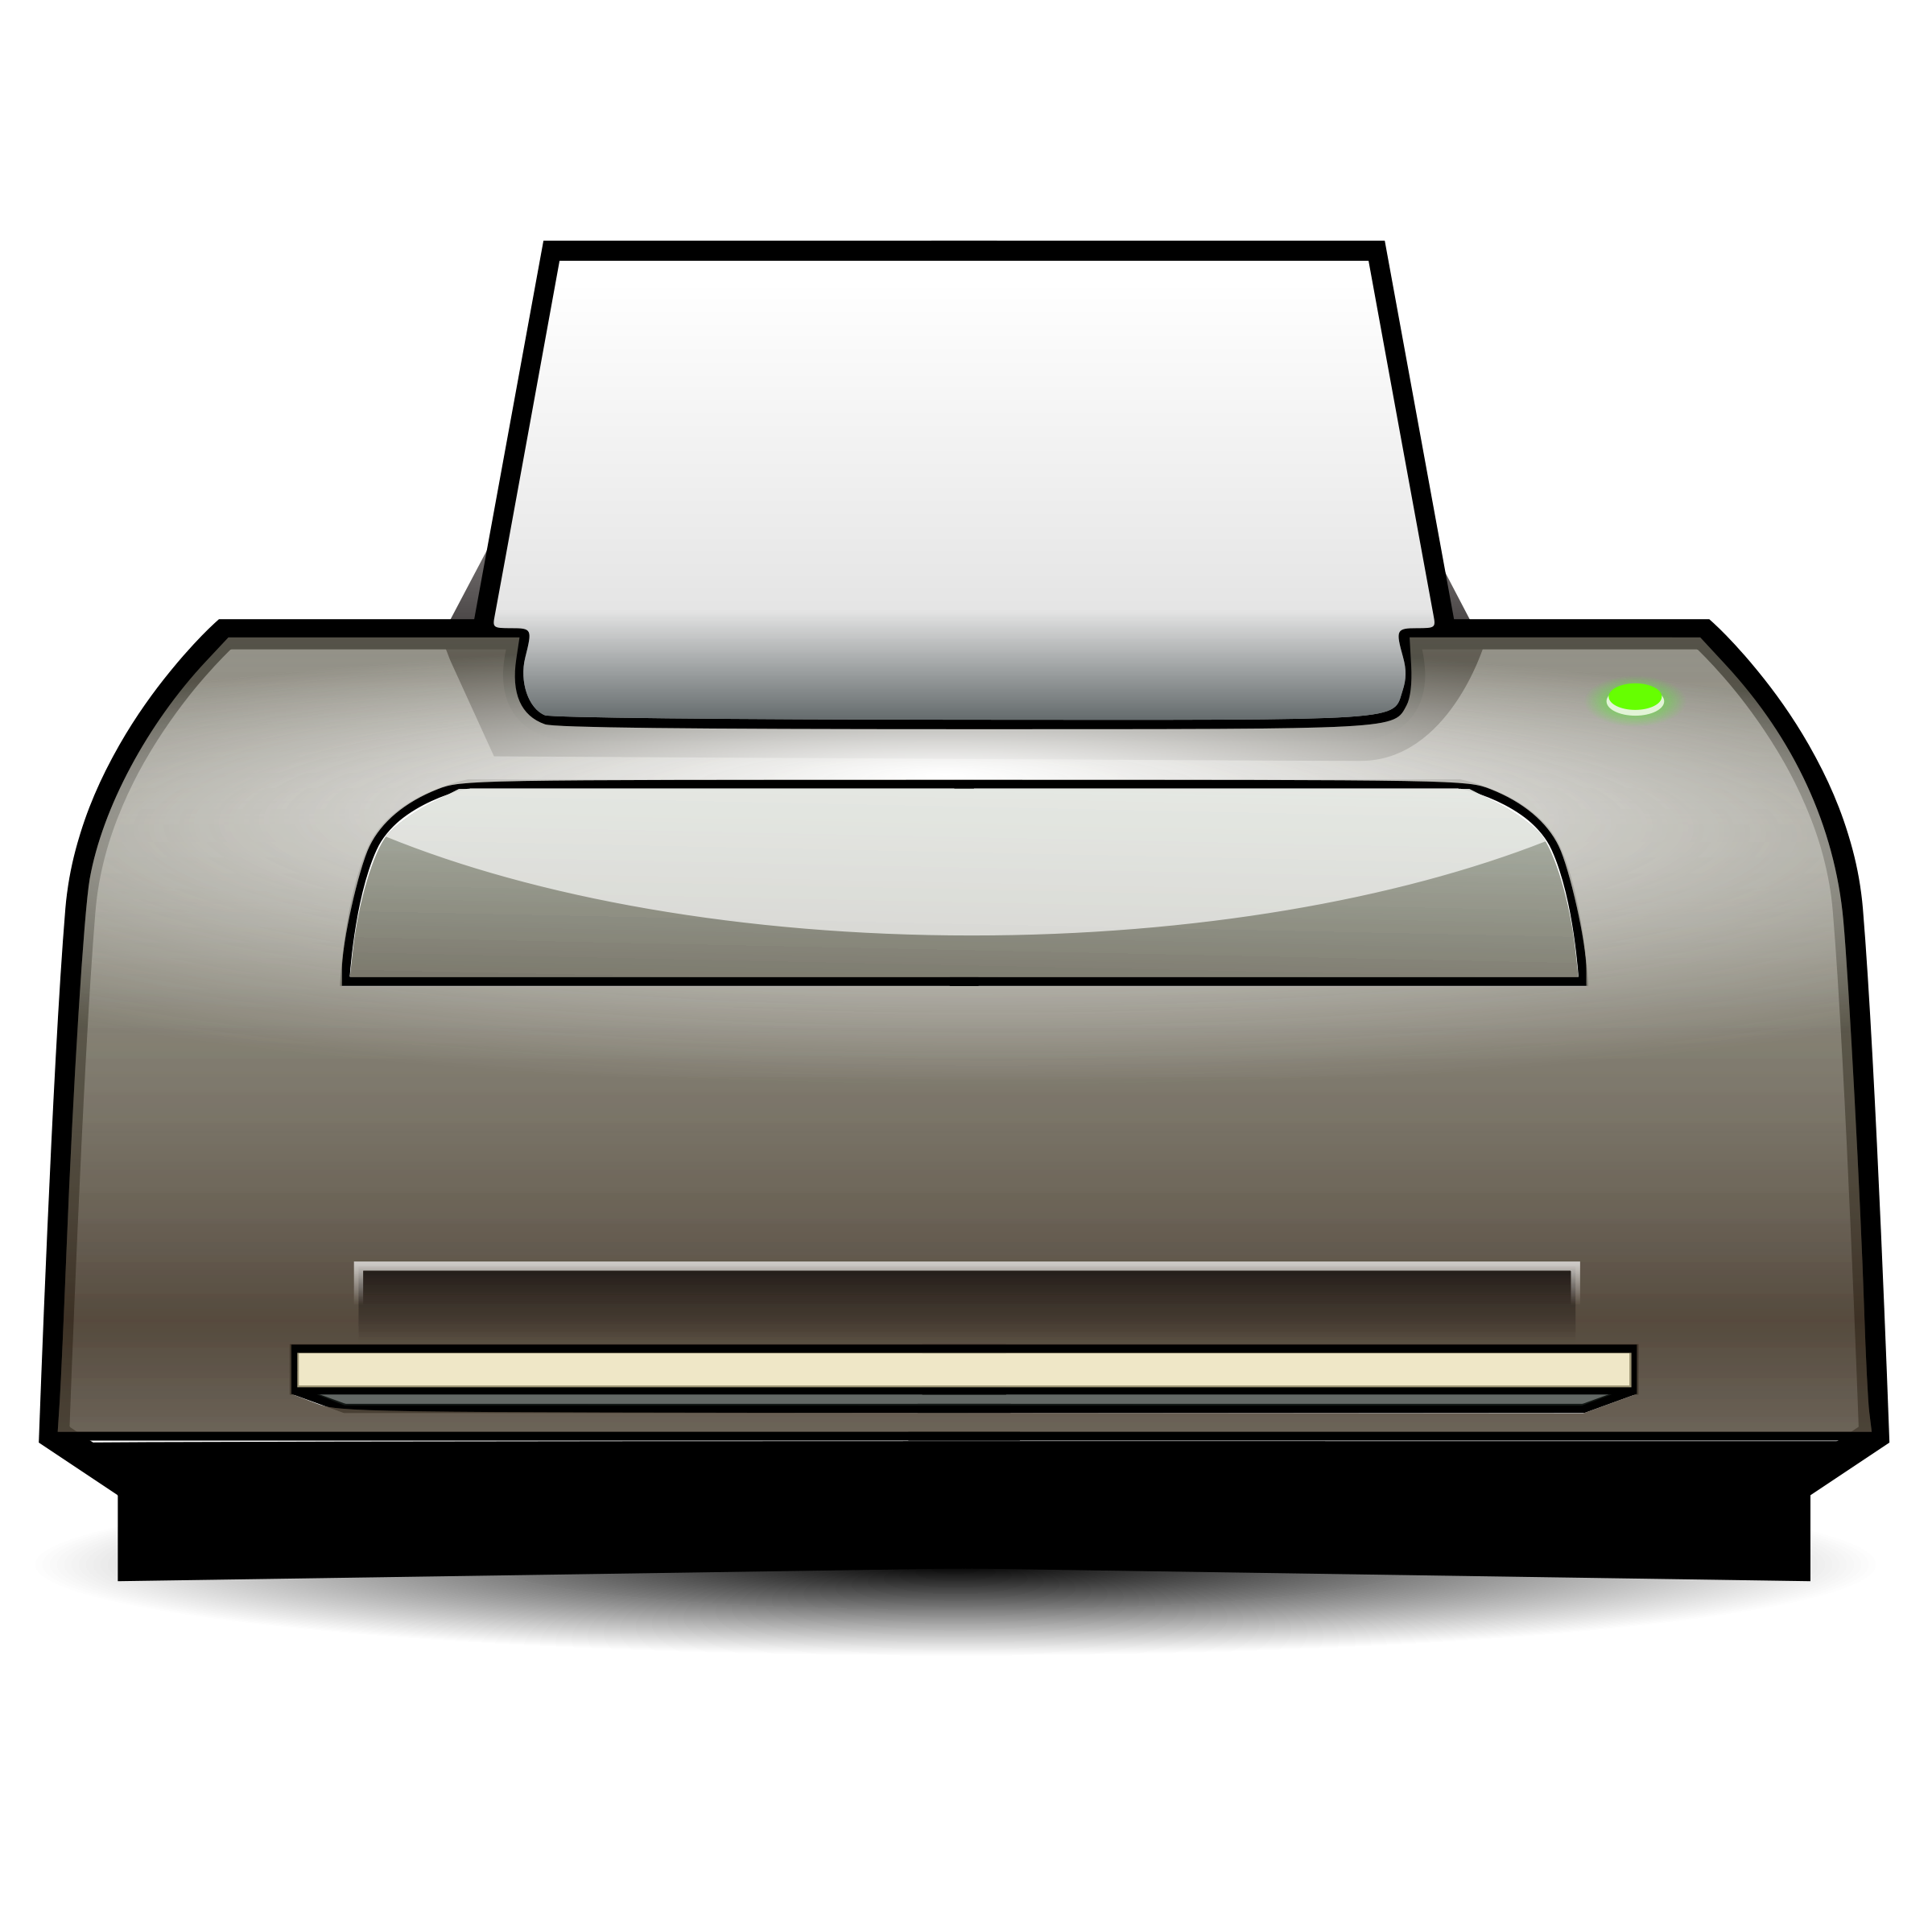 Clip Art Printer Clip Art computer printer clipart panda free images